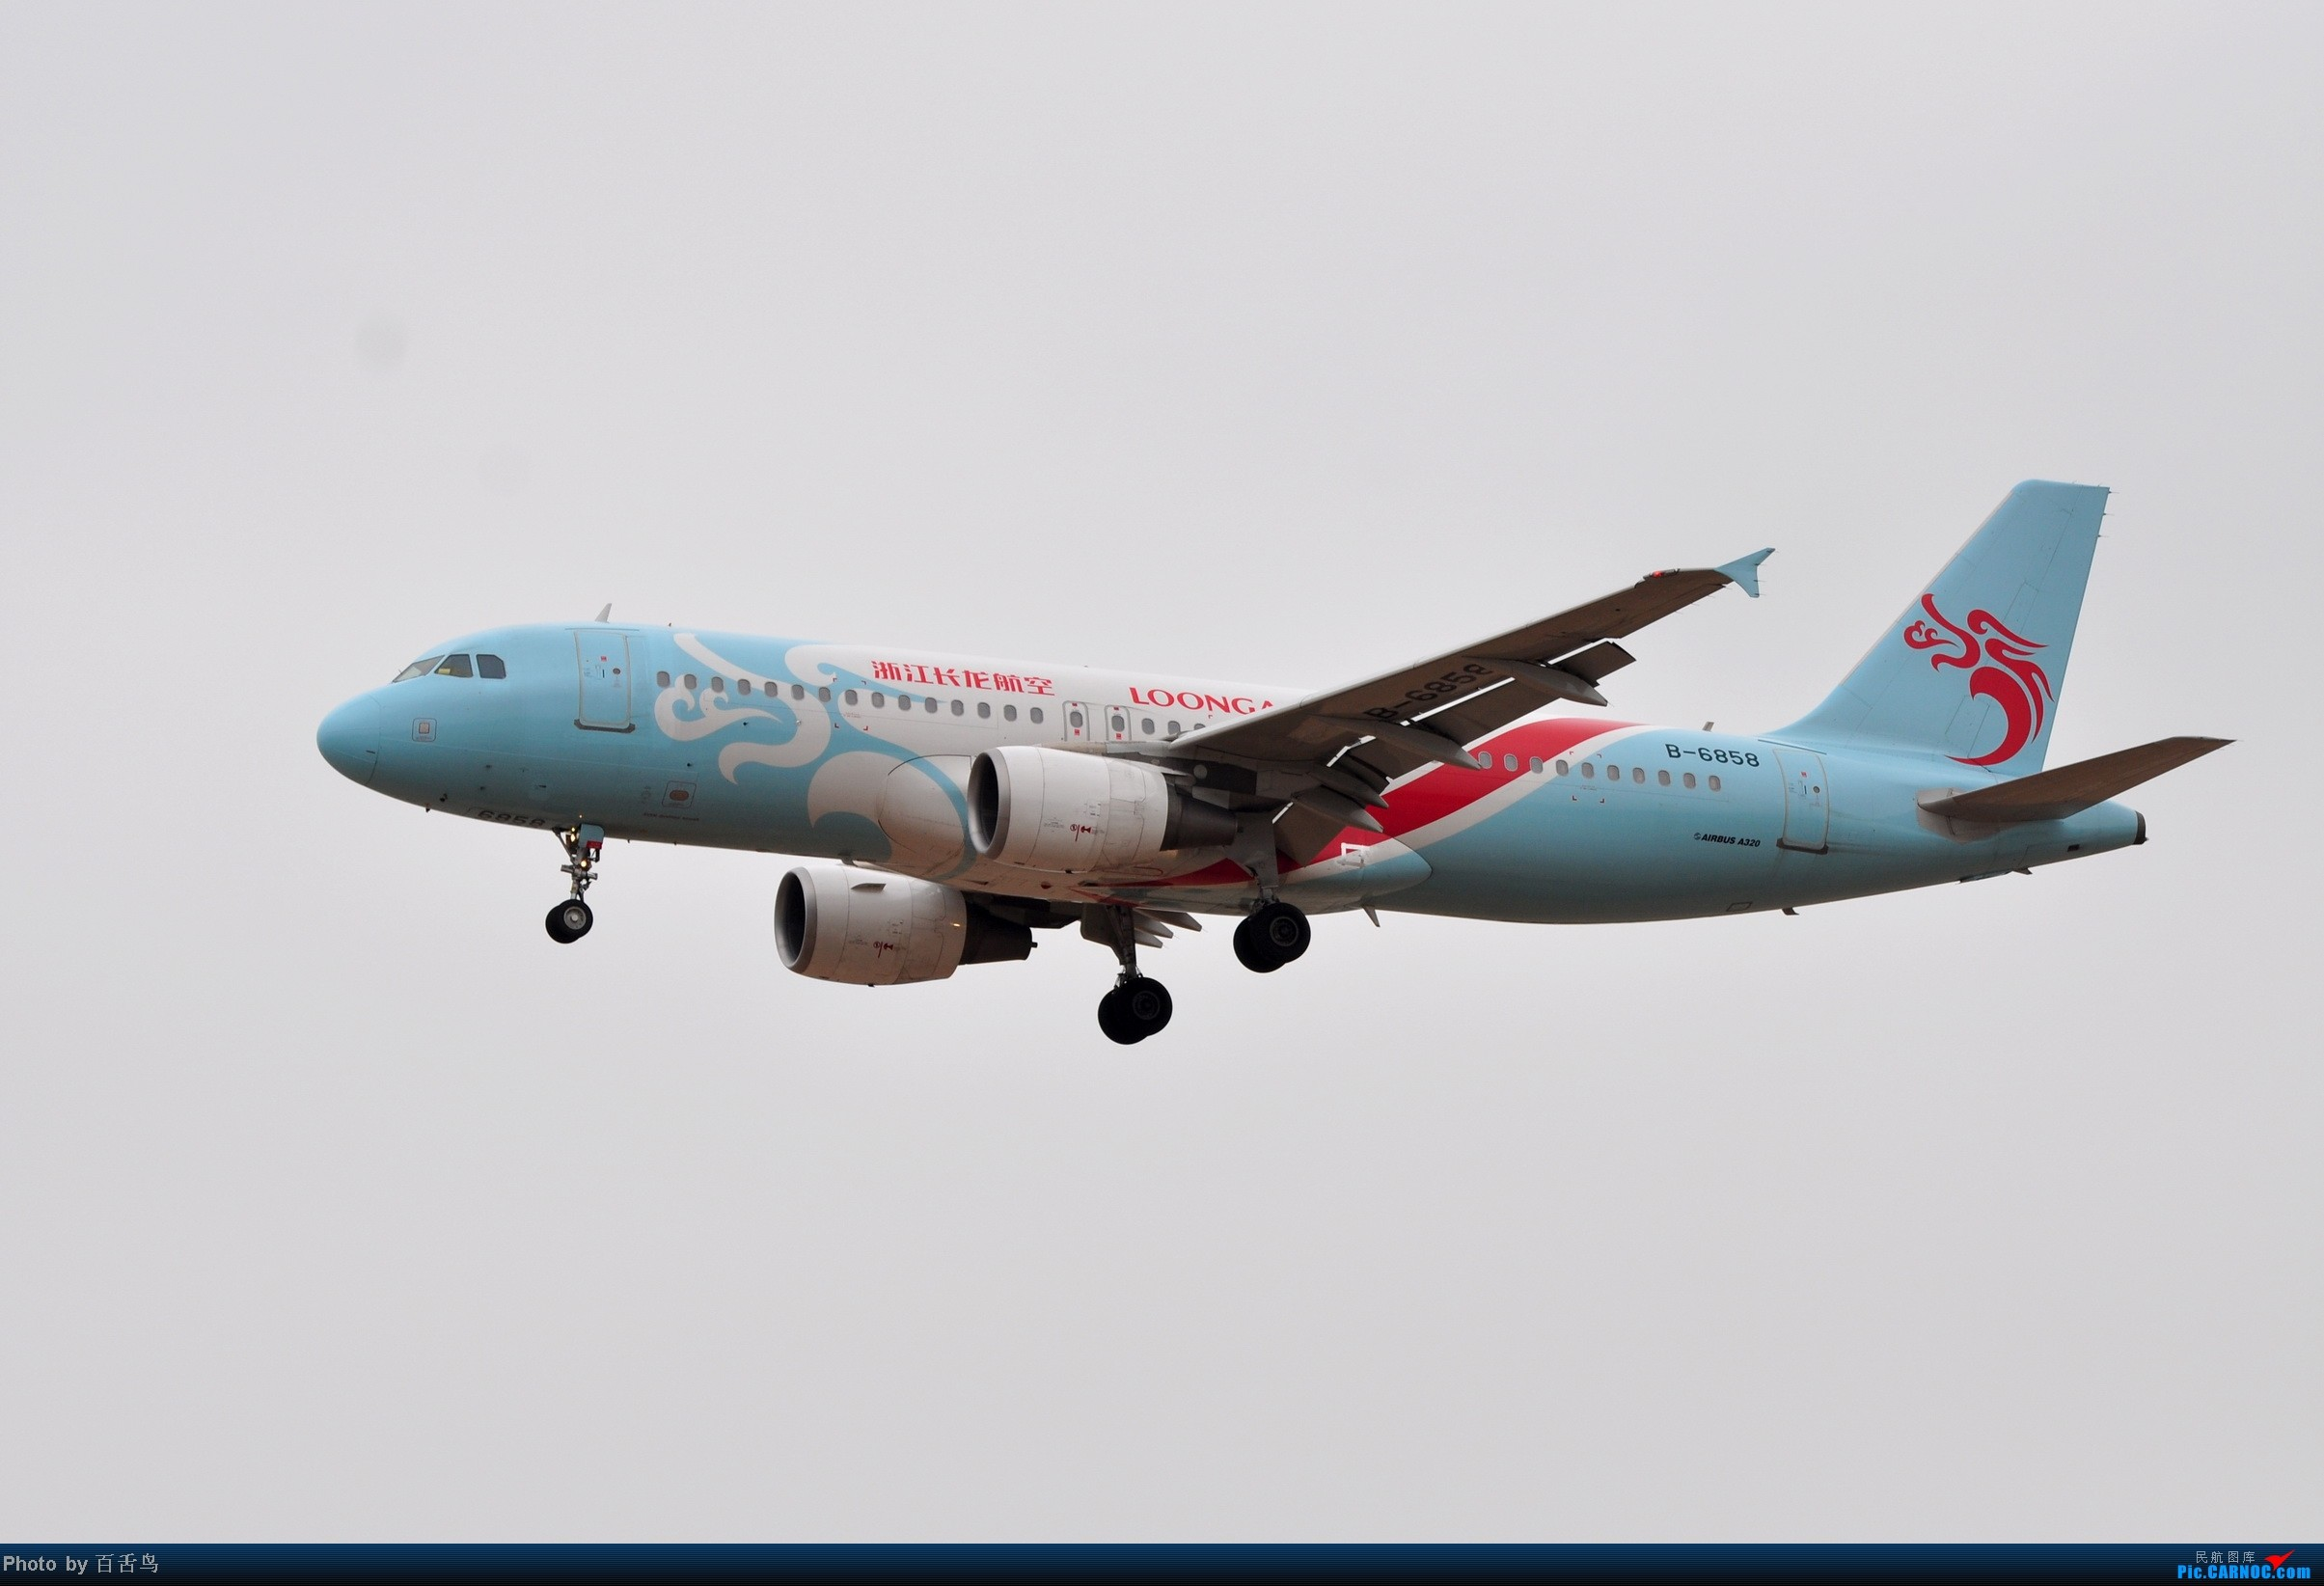 Re:[原创]【白云拍机】追南航773未果,东跑随手拍 AIRBUS A320-200 B-6858 中国广州白云机场